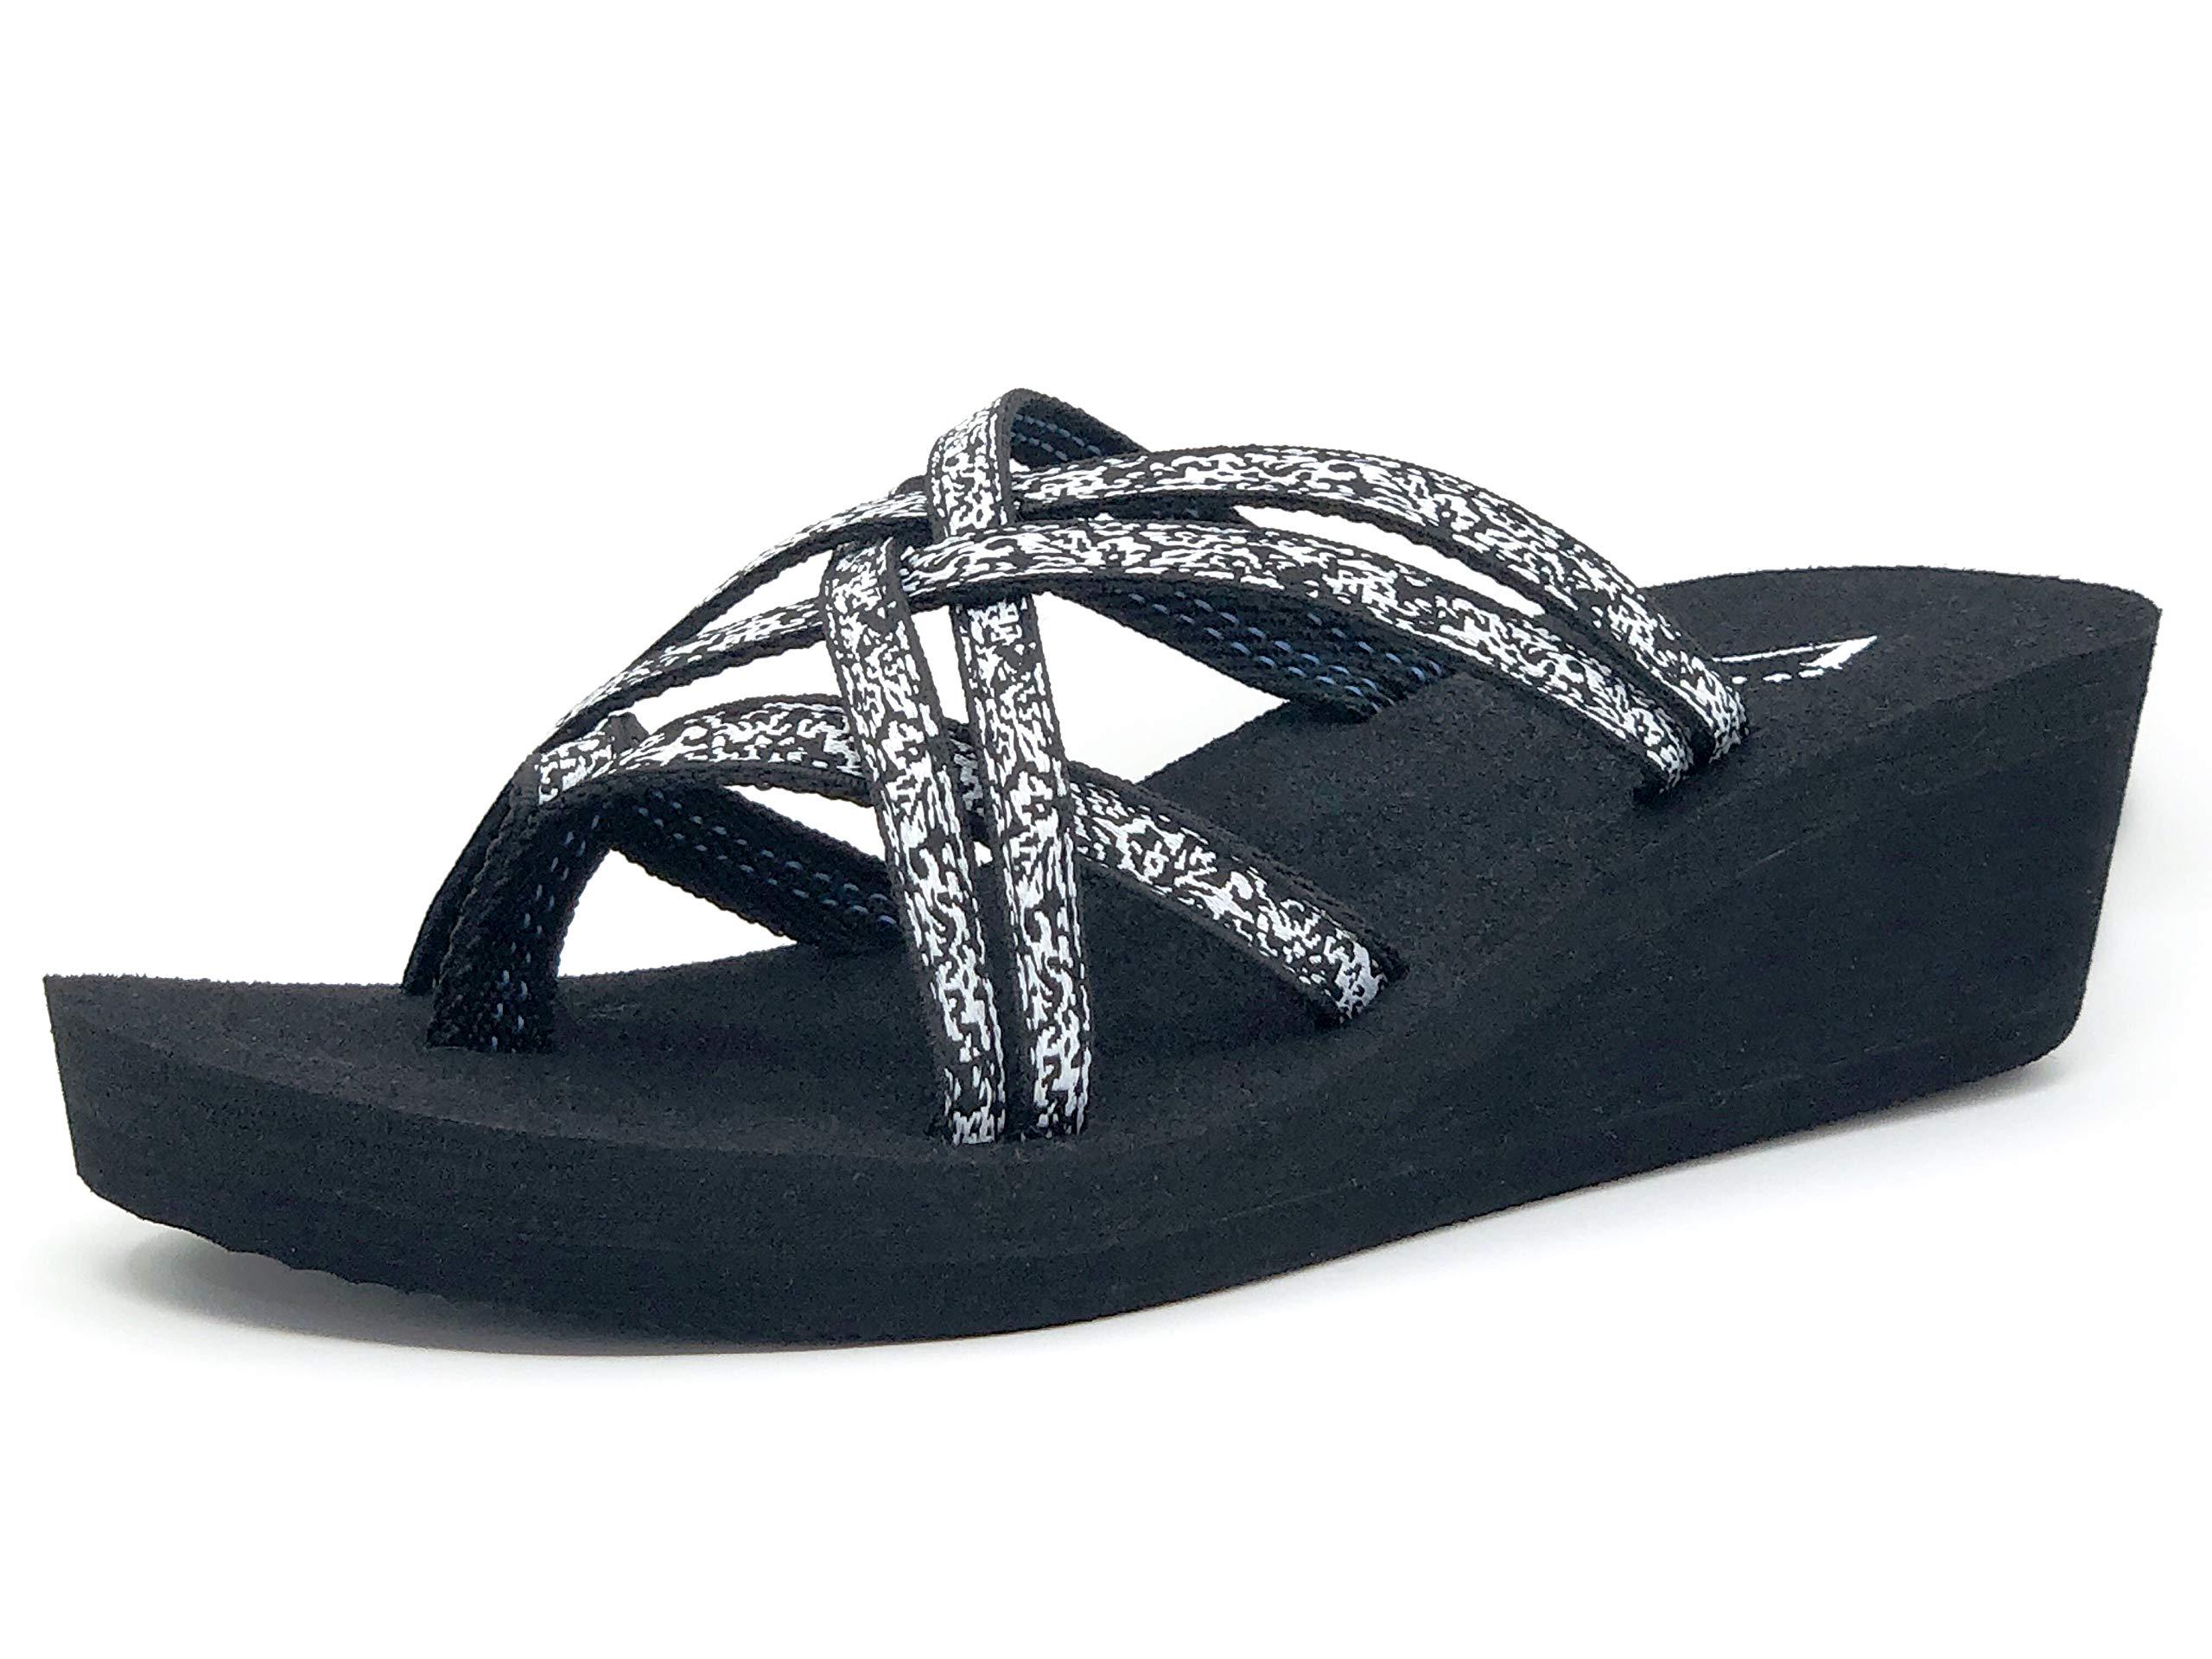 Viakix Wedge Flip Flops for Women – Comfortable, Stylish, Cute, Women's Strappy Sandal for Walking, Beach, Travel by Viakix (Image #2)